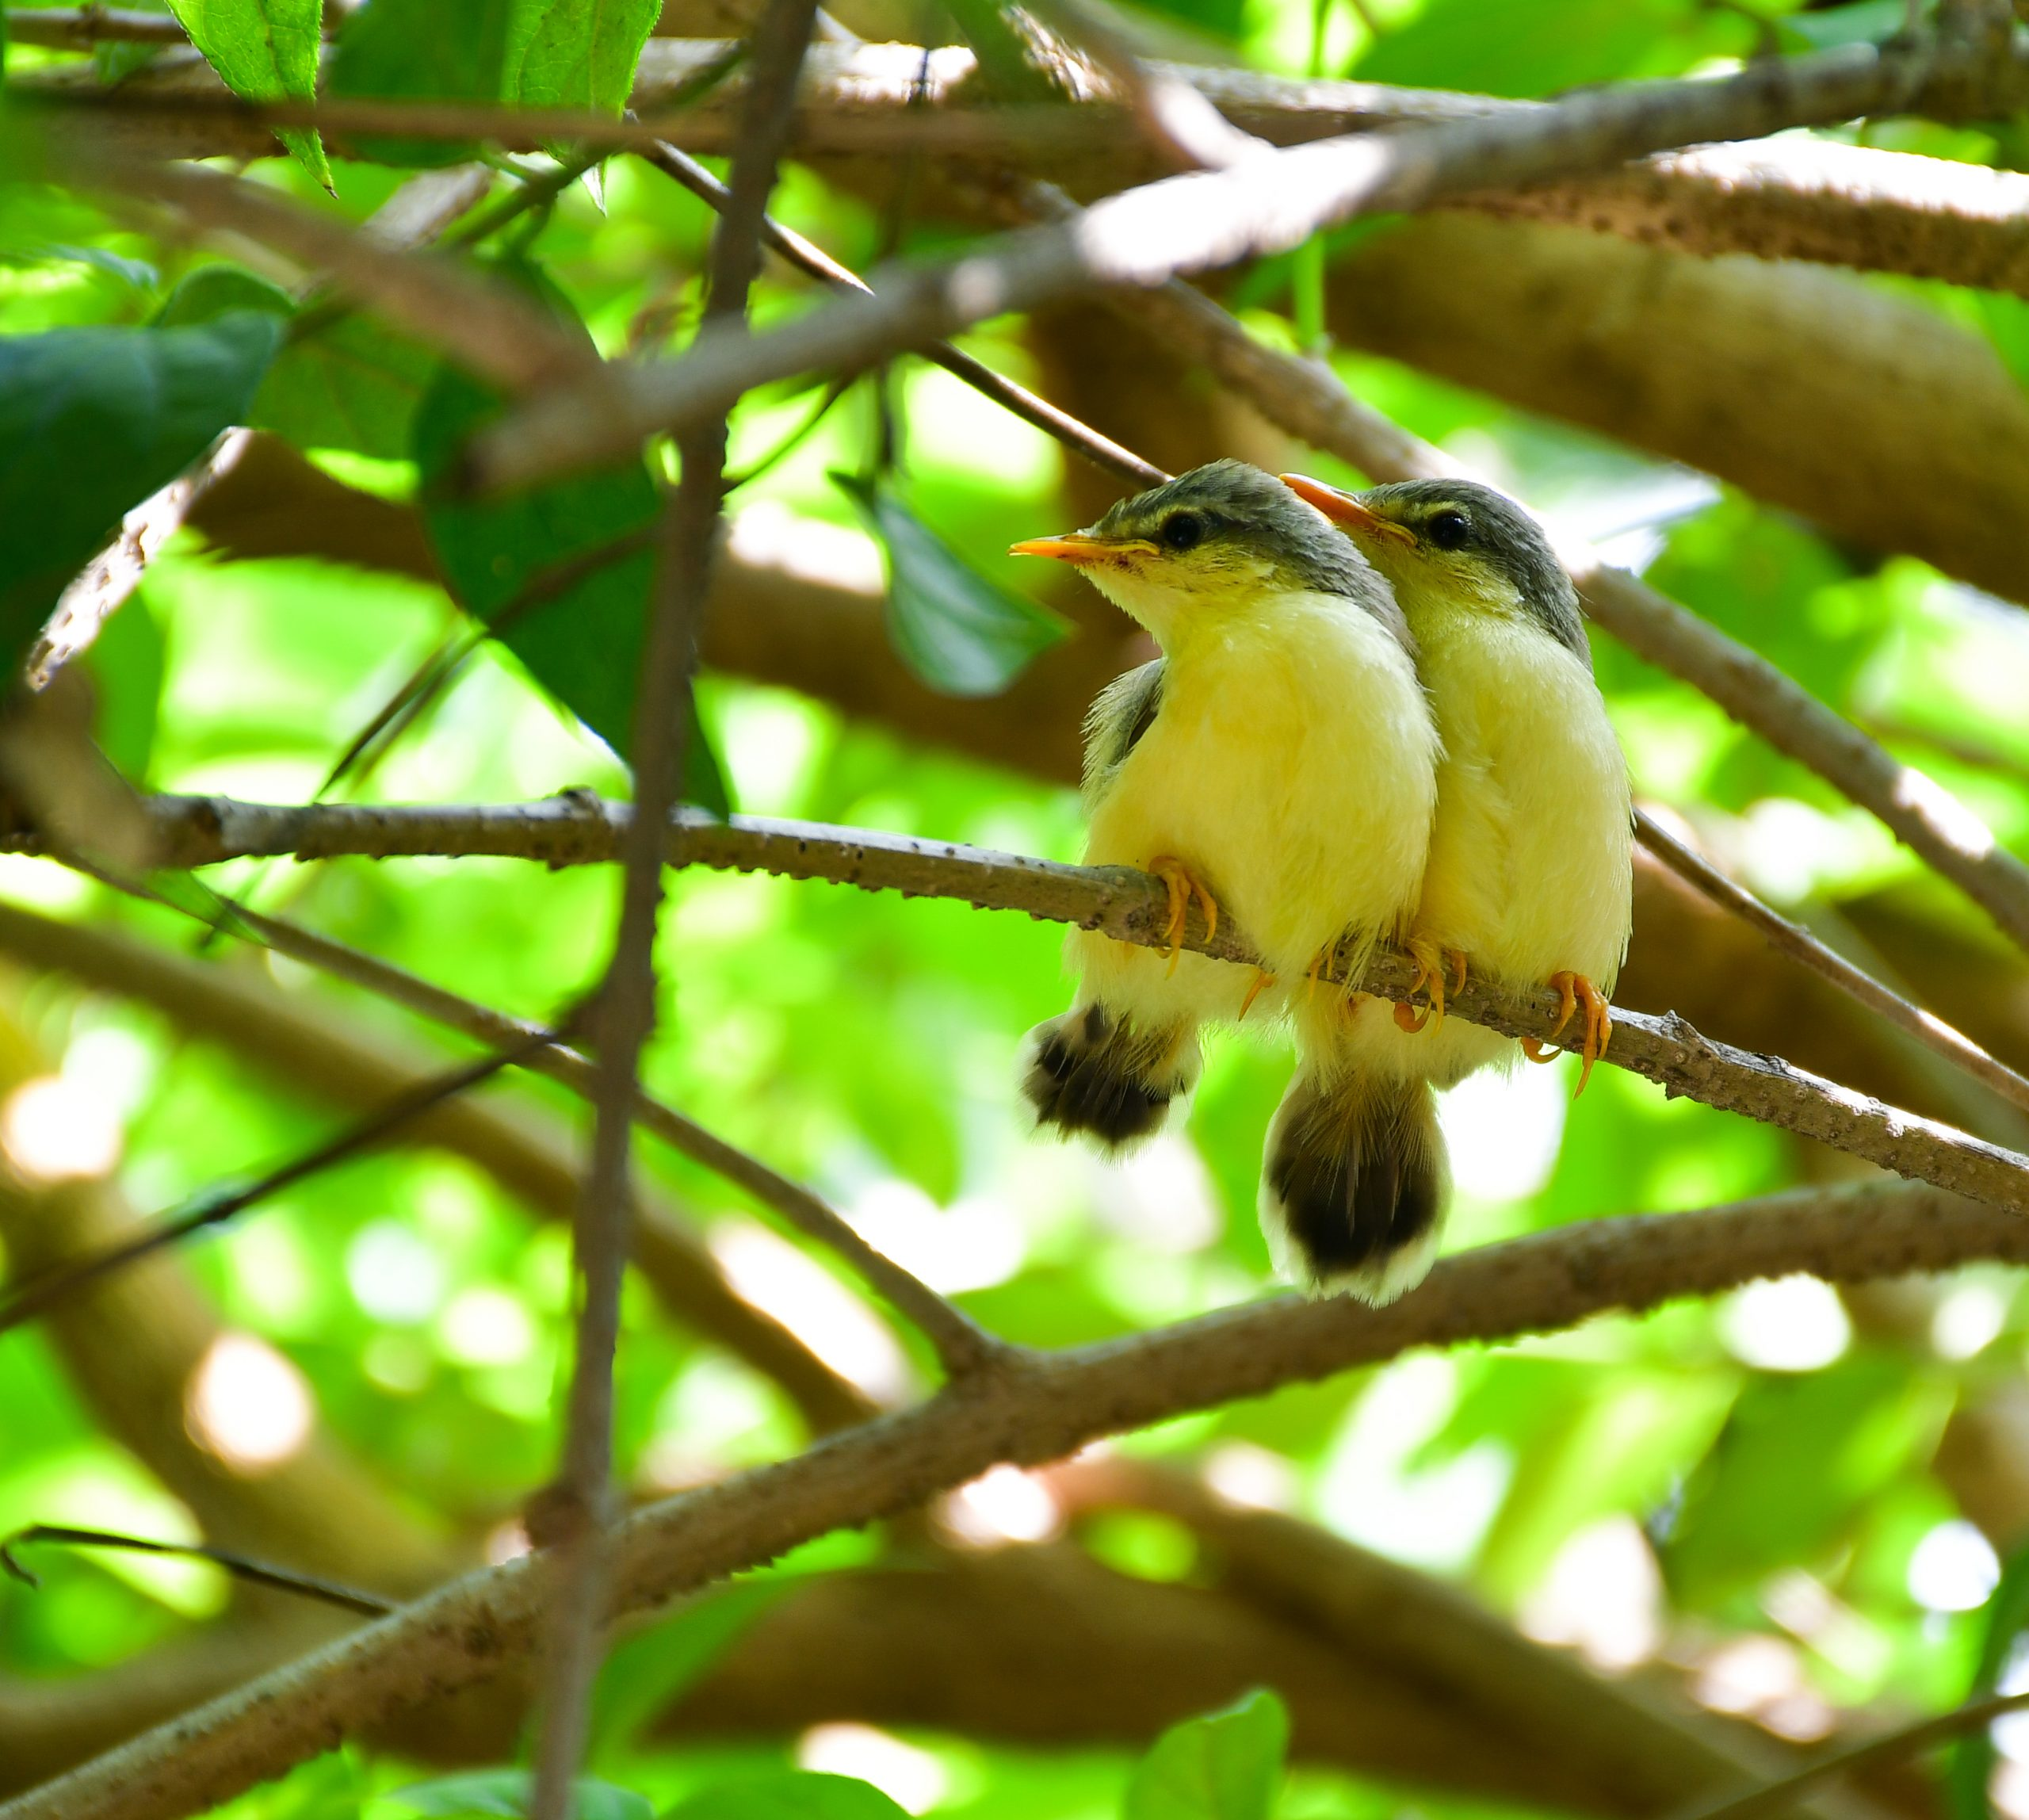 Two Ashy Prinia fledgling babies in sync